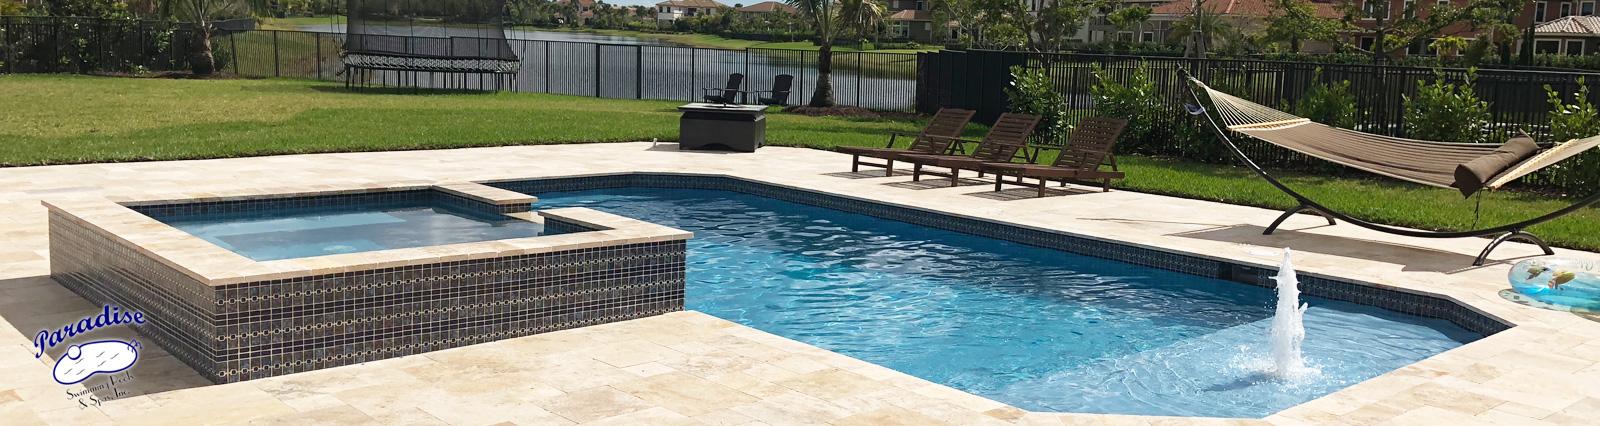 Paradise Pools And Spa, Paradise Inground Pools